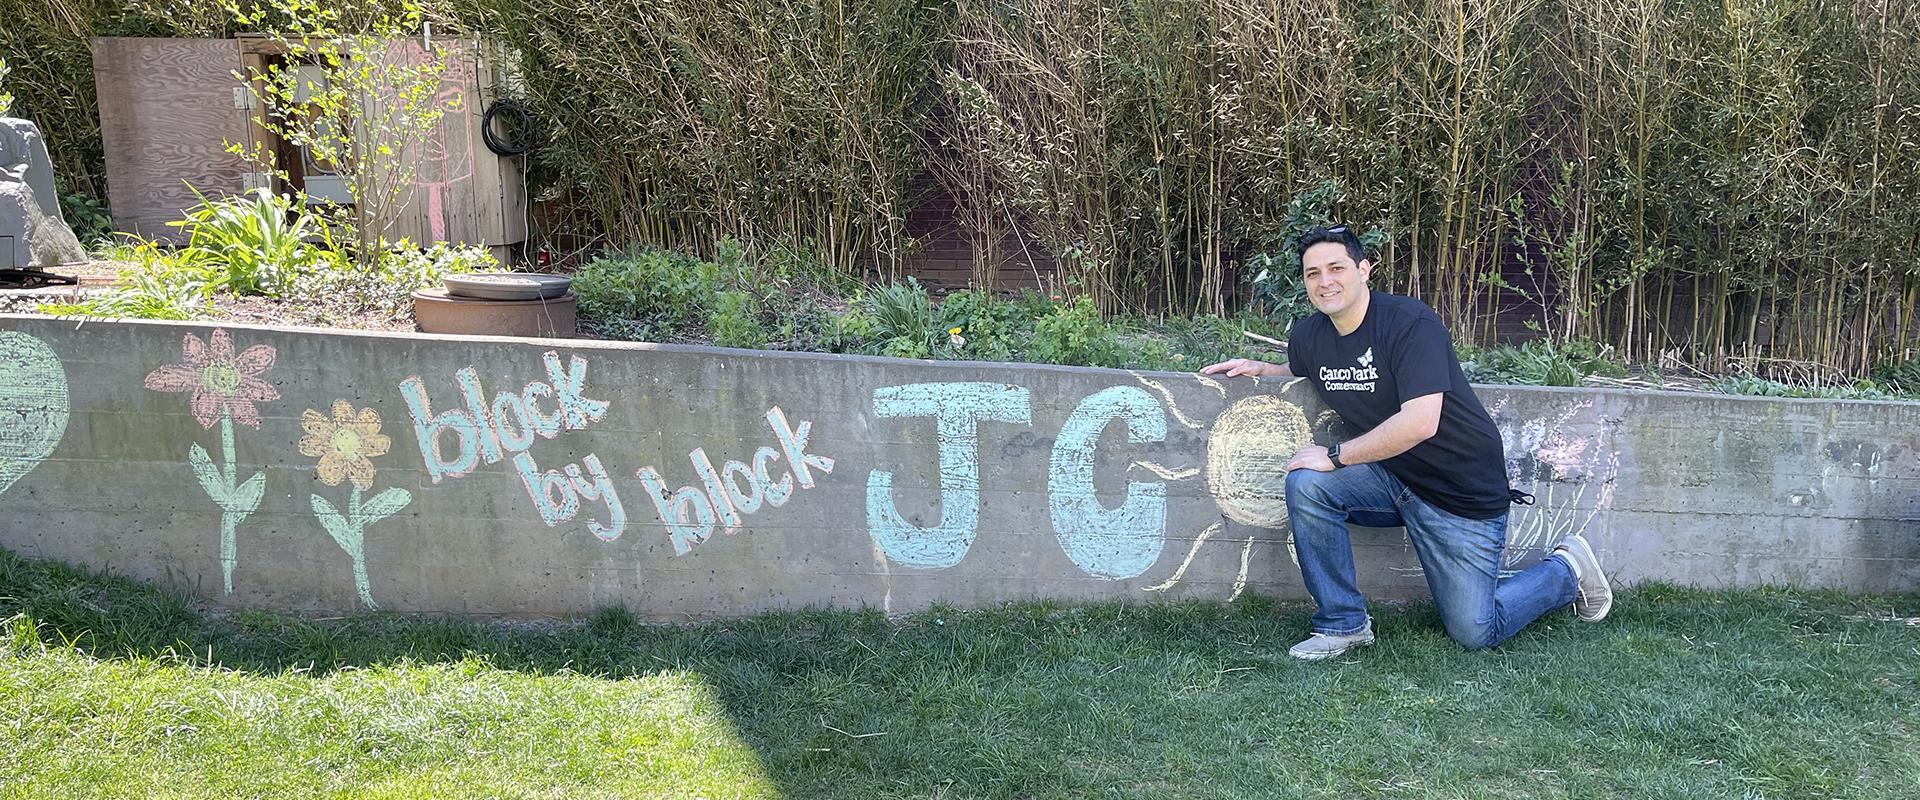 chalk-wall-800